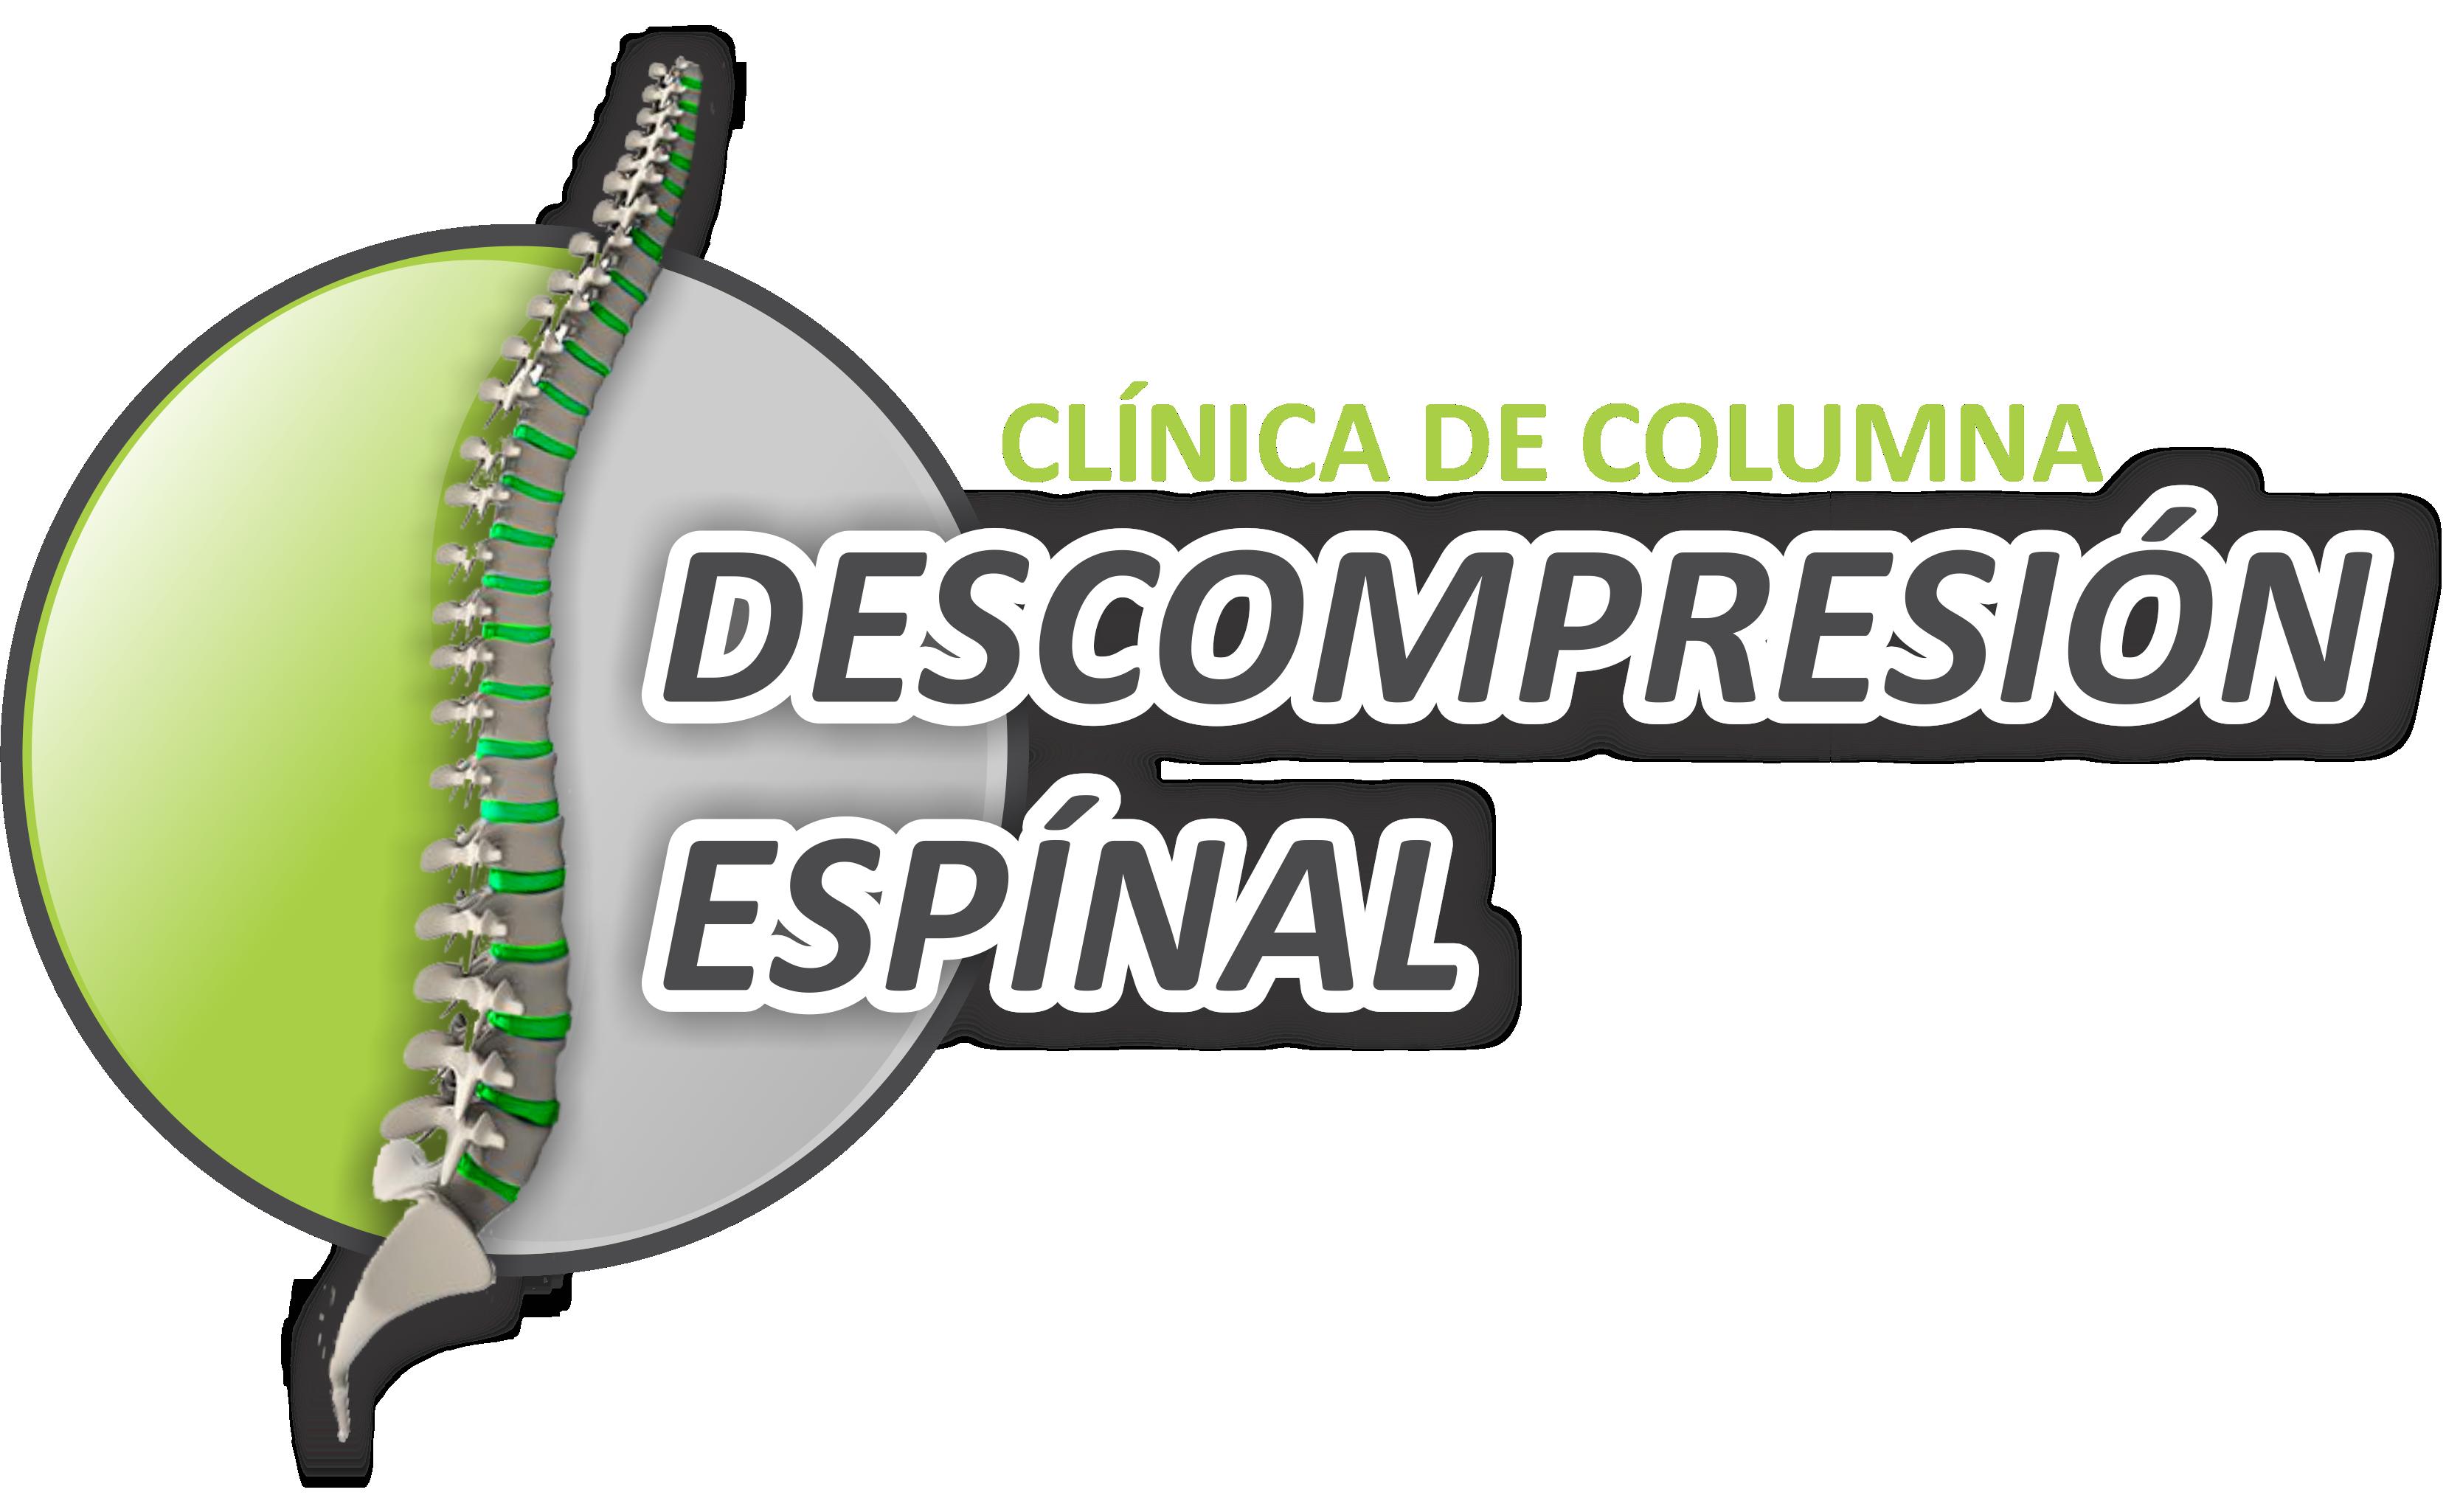 CLÍNICA DE COLUMNA CELAYA